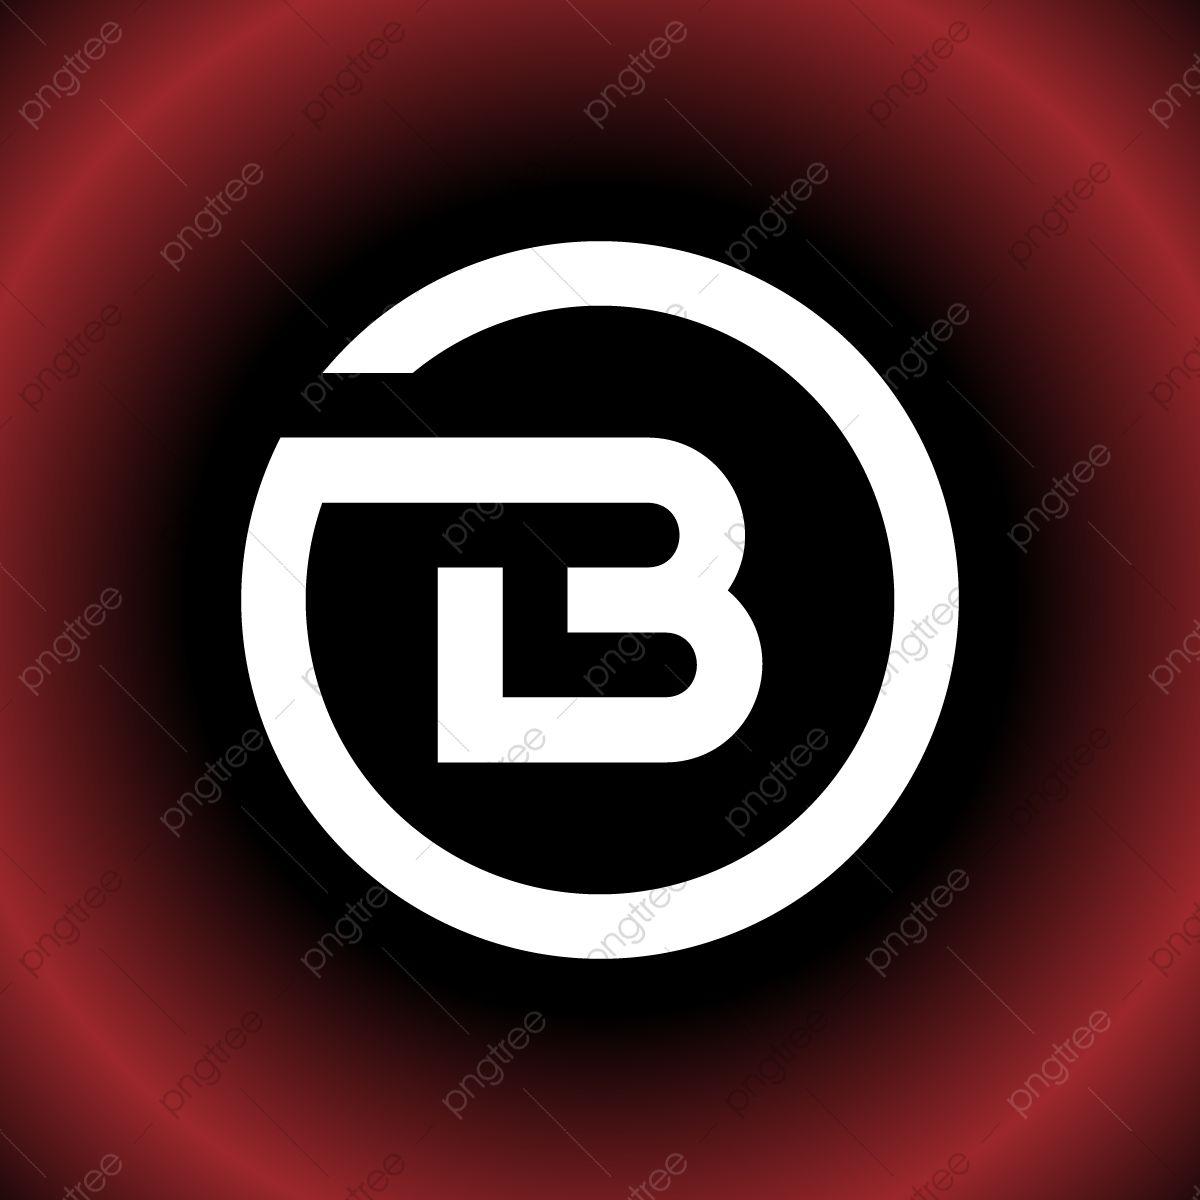 Circular Letter B Ob Db Vector Logo Design Icon Arrow Sign Png And Vector With Transparent Background For Free Download Vector Logo Design Logo Design Vector Logo